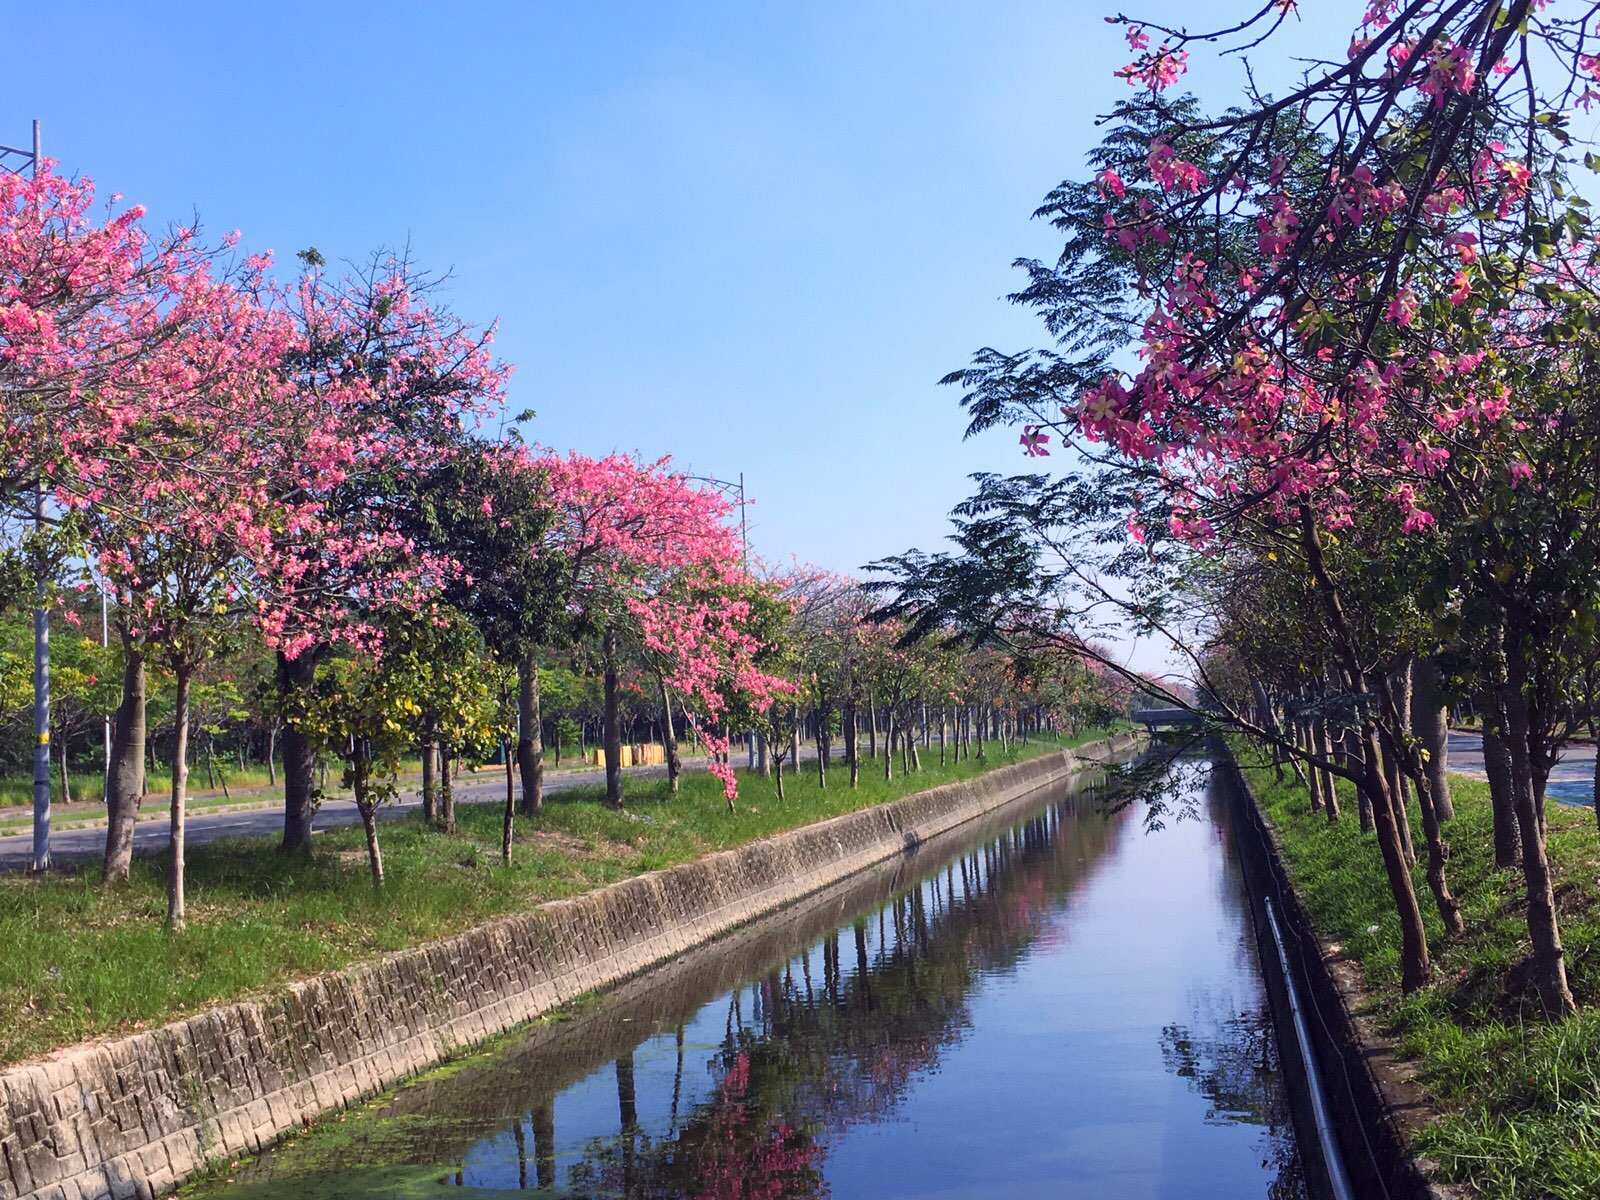 silk floss trees nobgbo park huwei yunlin taiwan